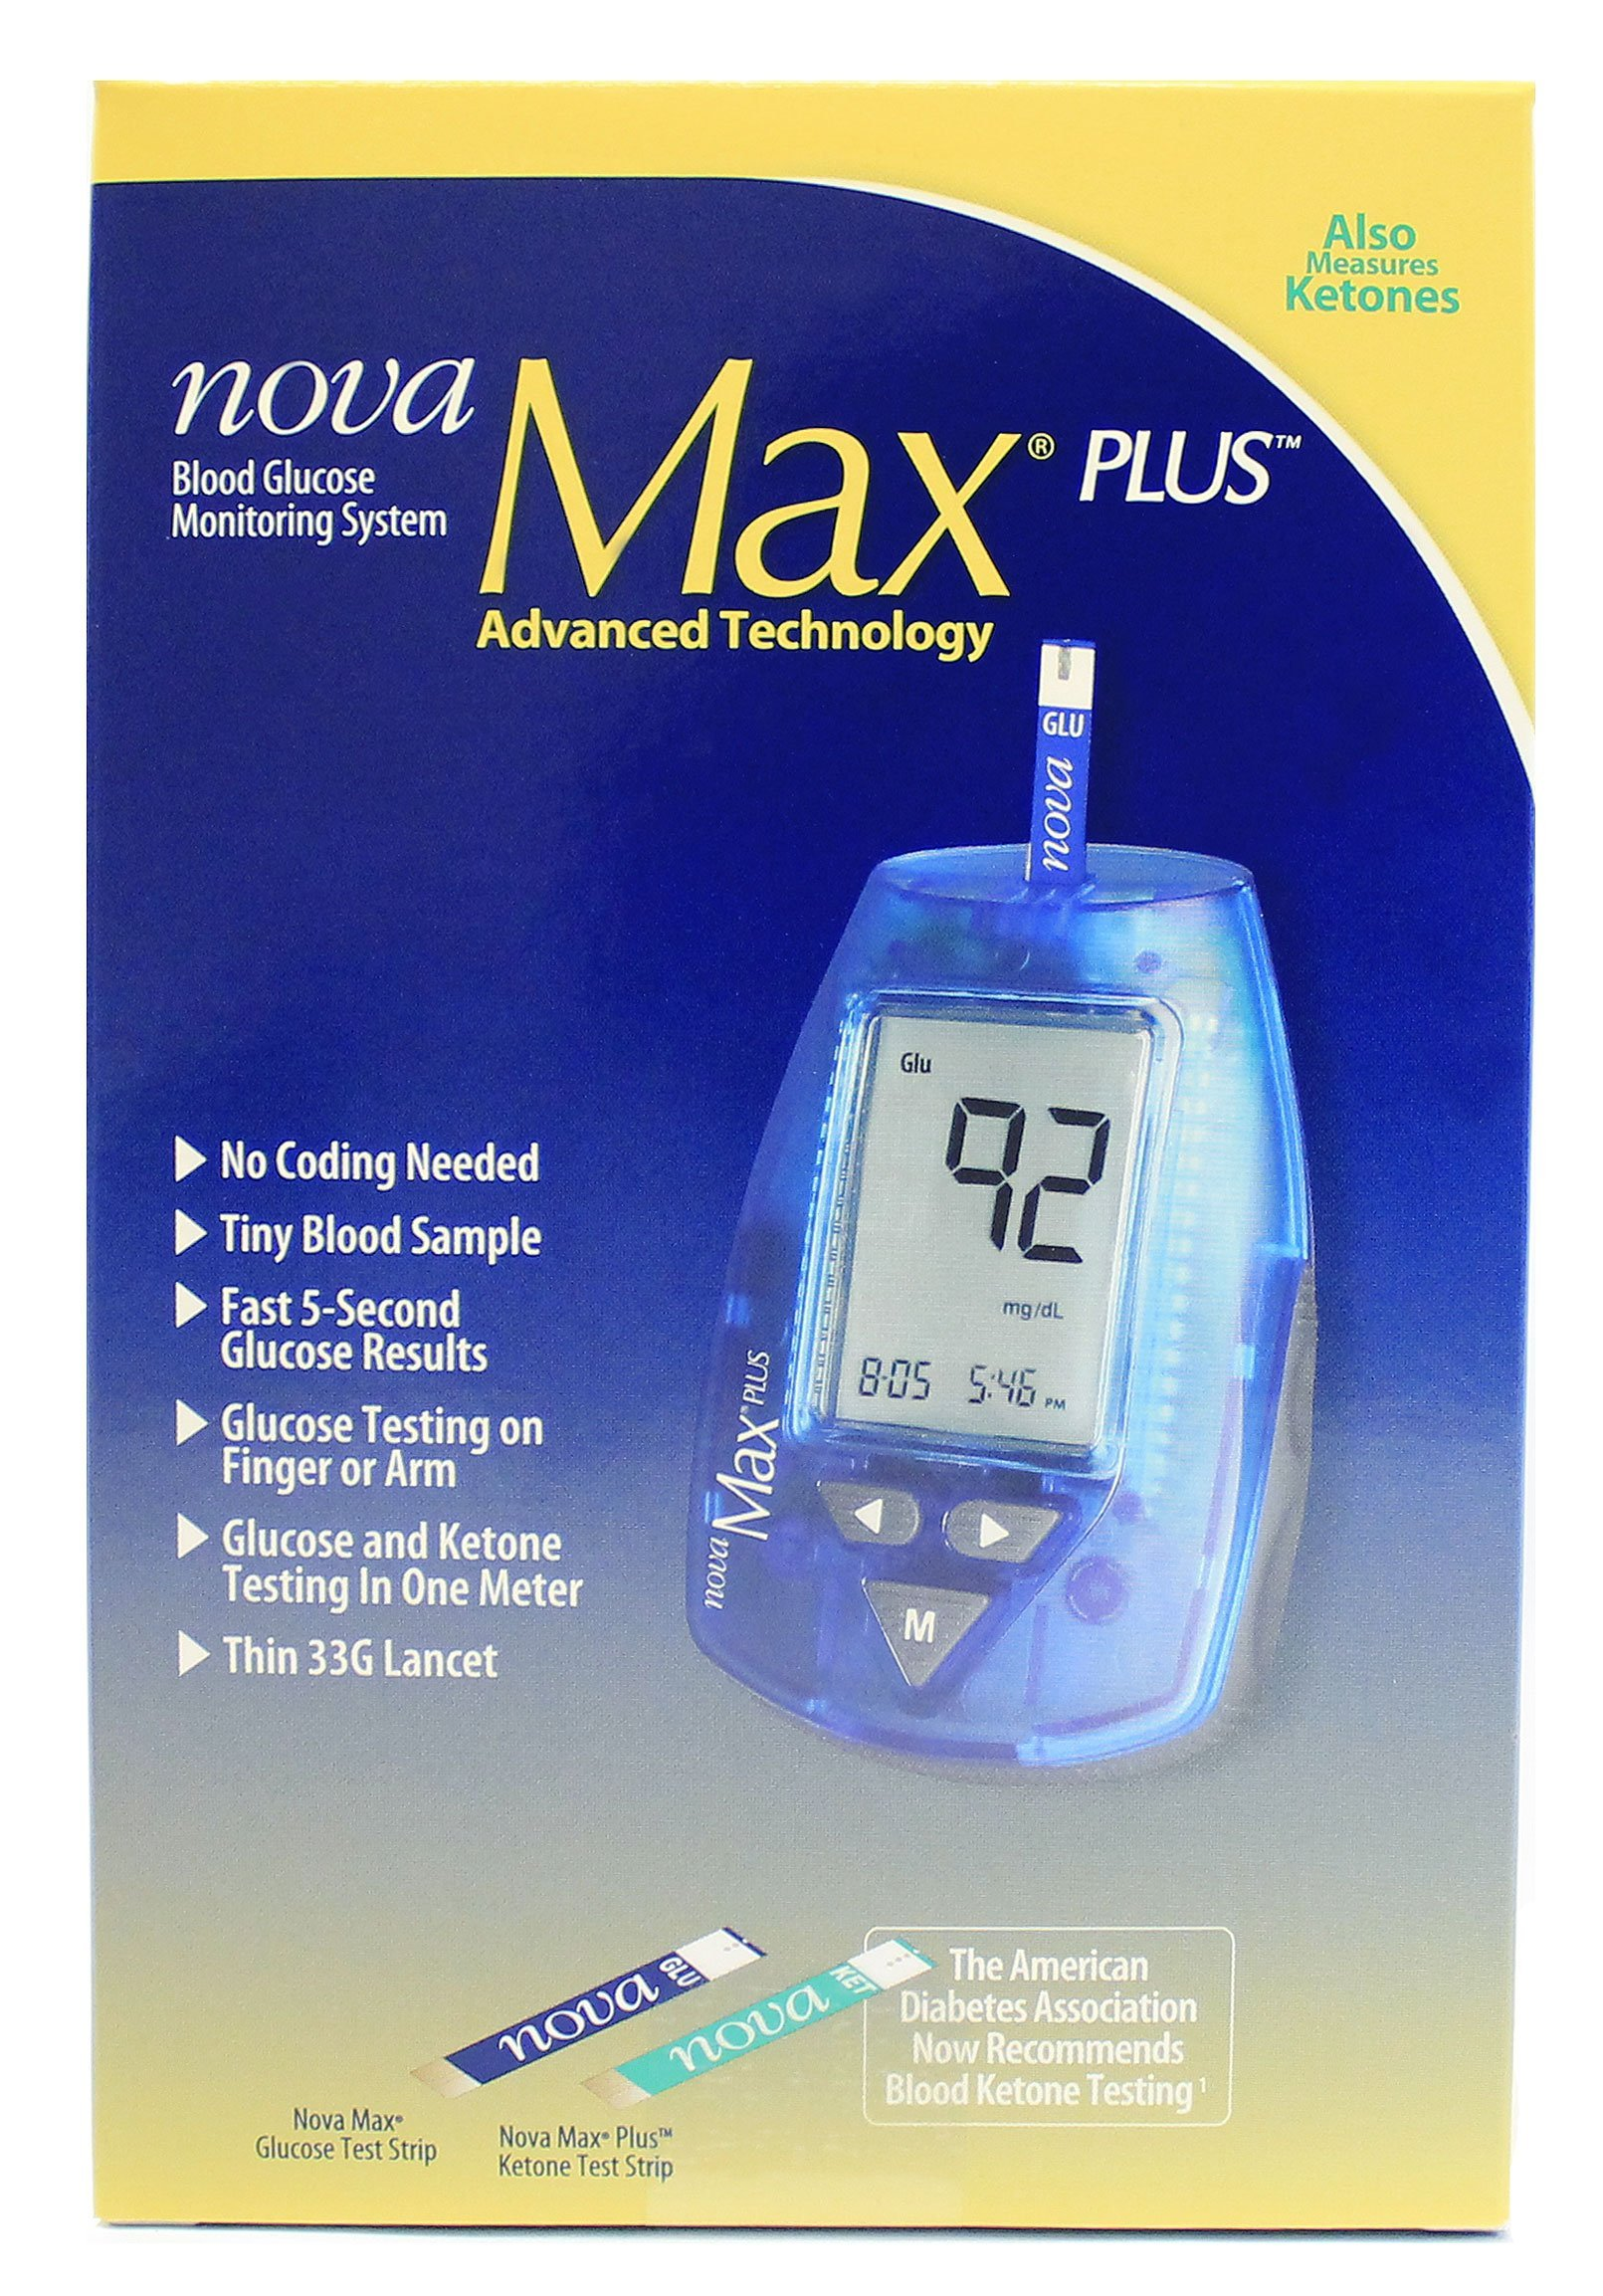 Nova Max Plus Glucose Monitoring System